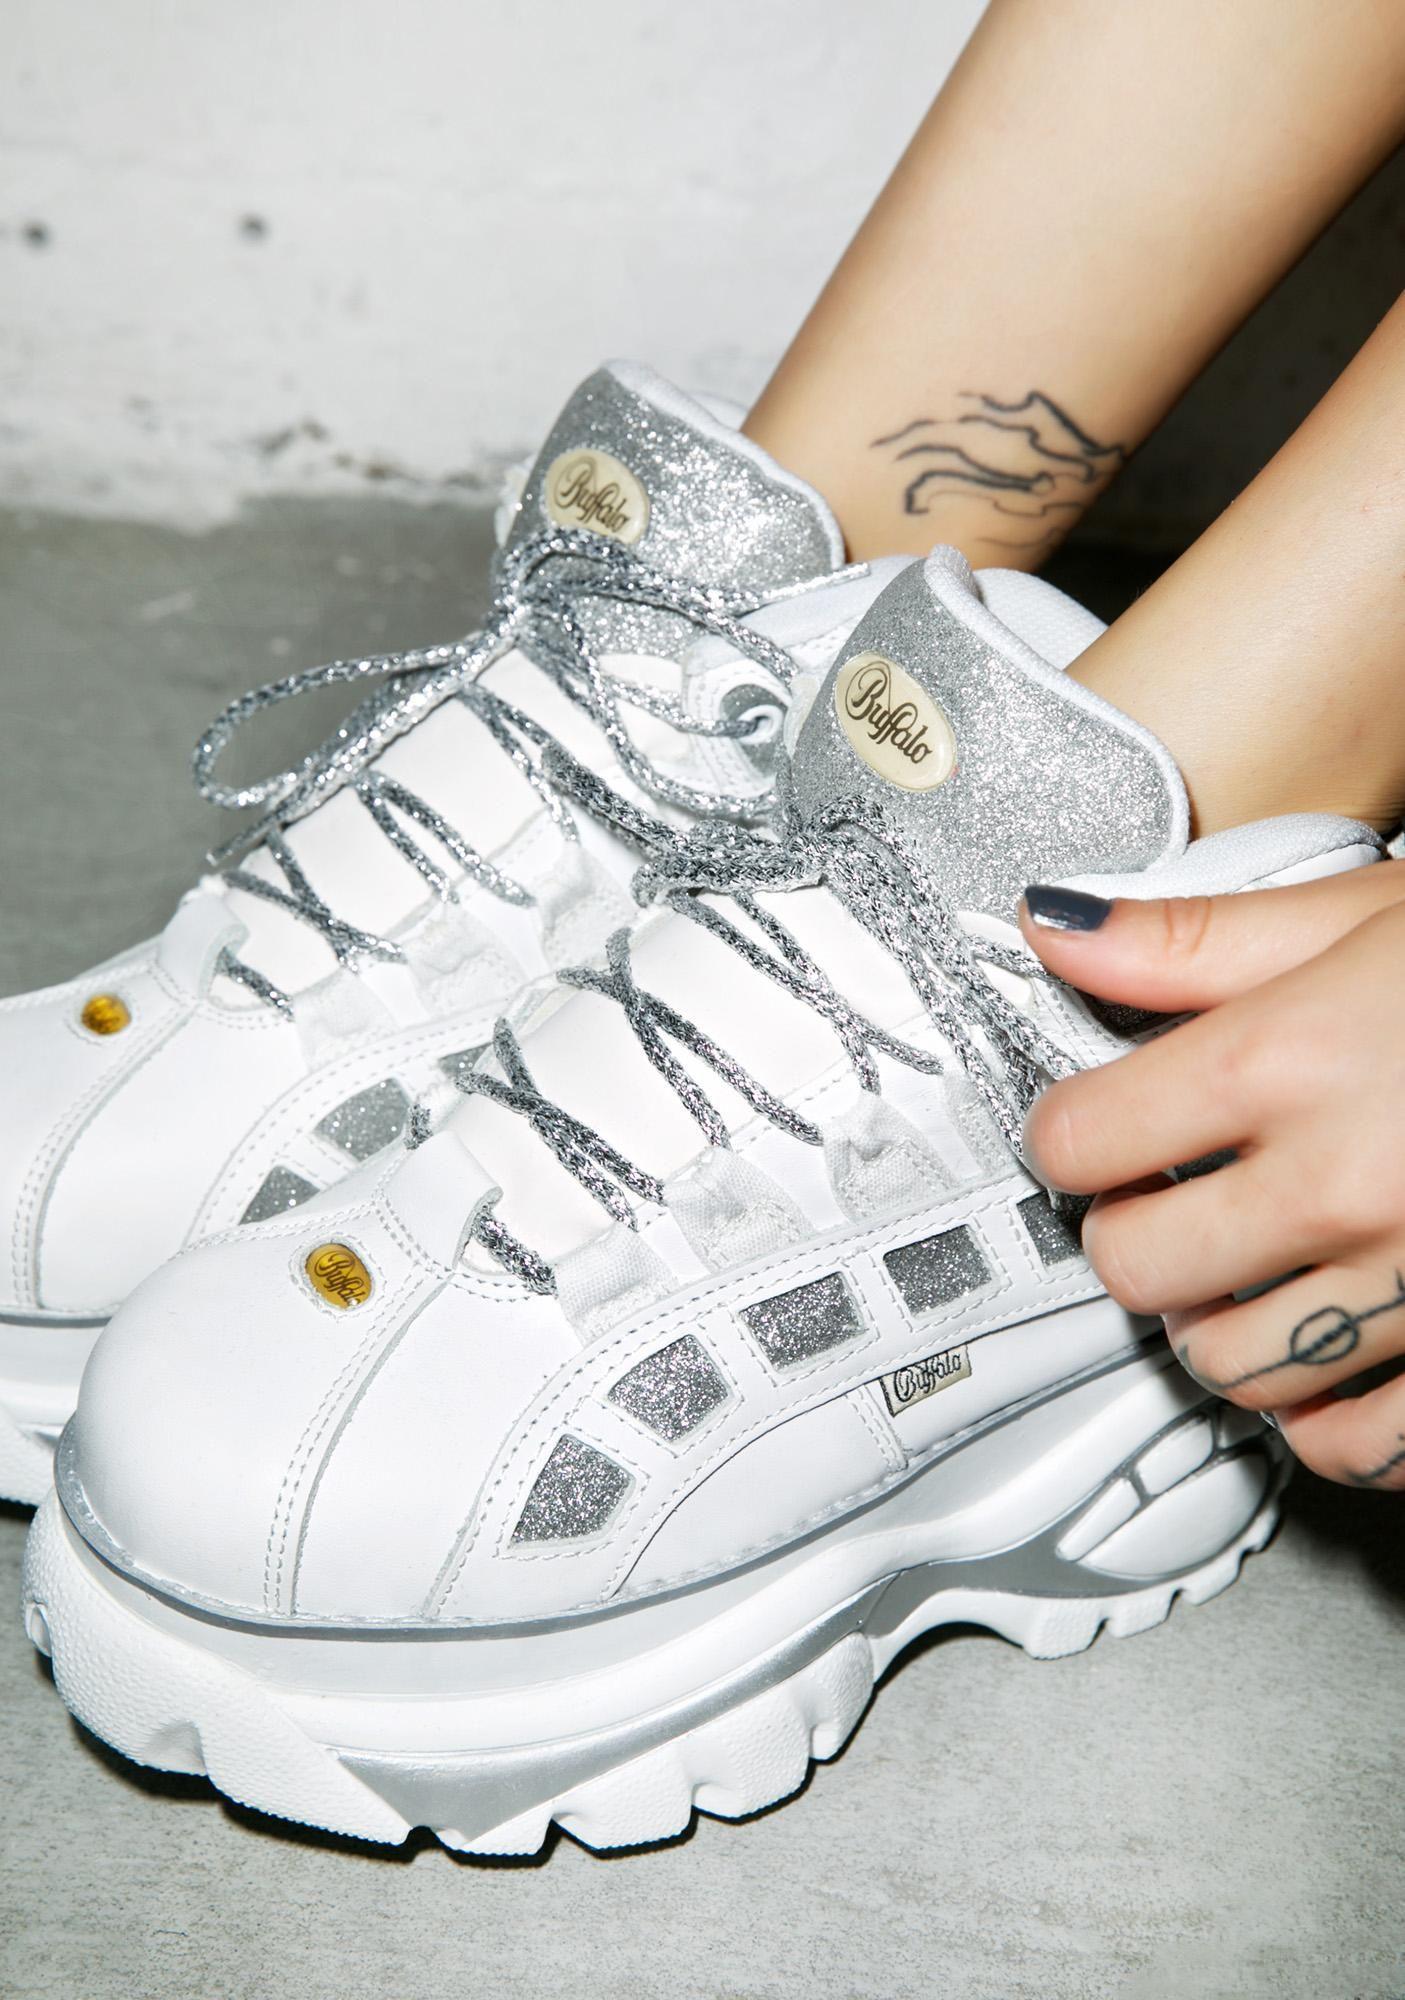 hot sale online 37c86 c9610 Bildresultat för buffalo white shoes   Outfits   White shoes ...